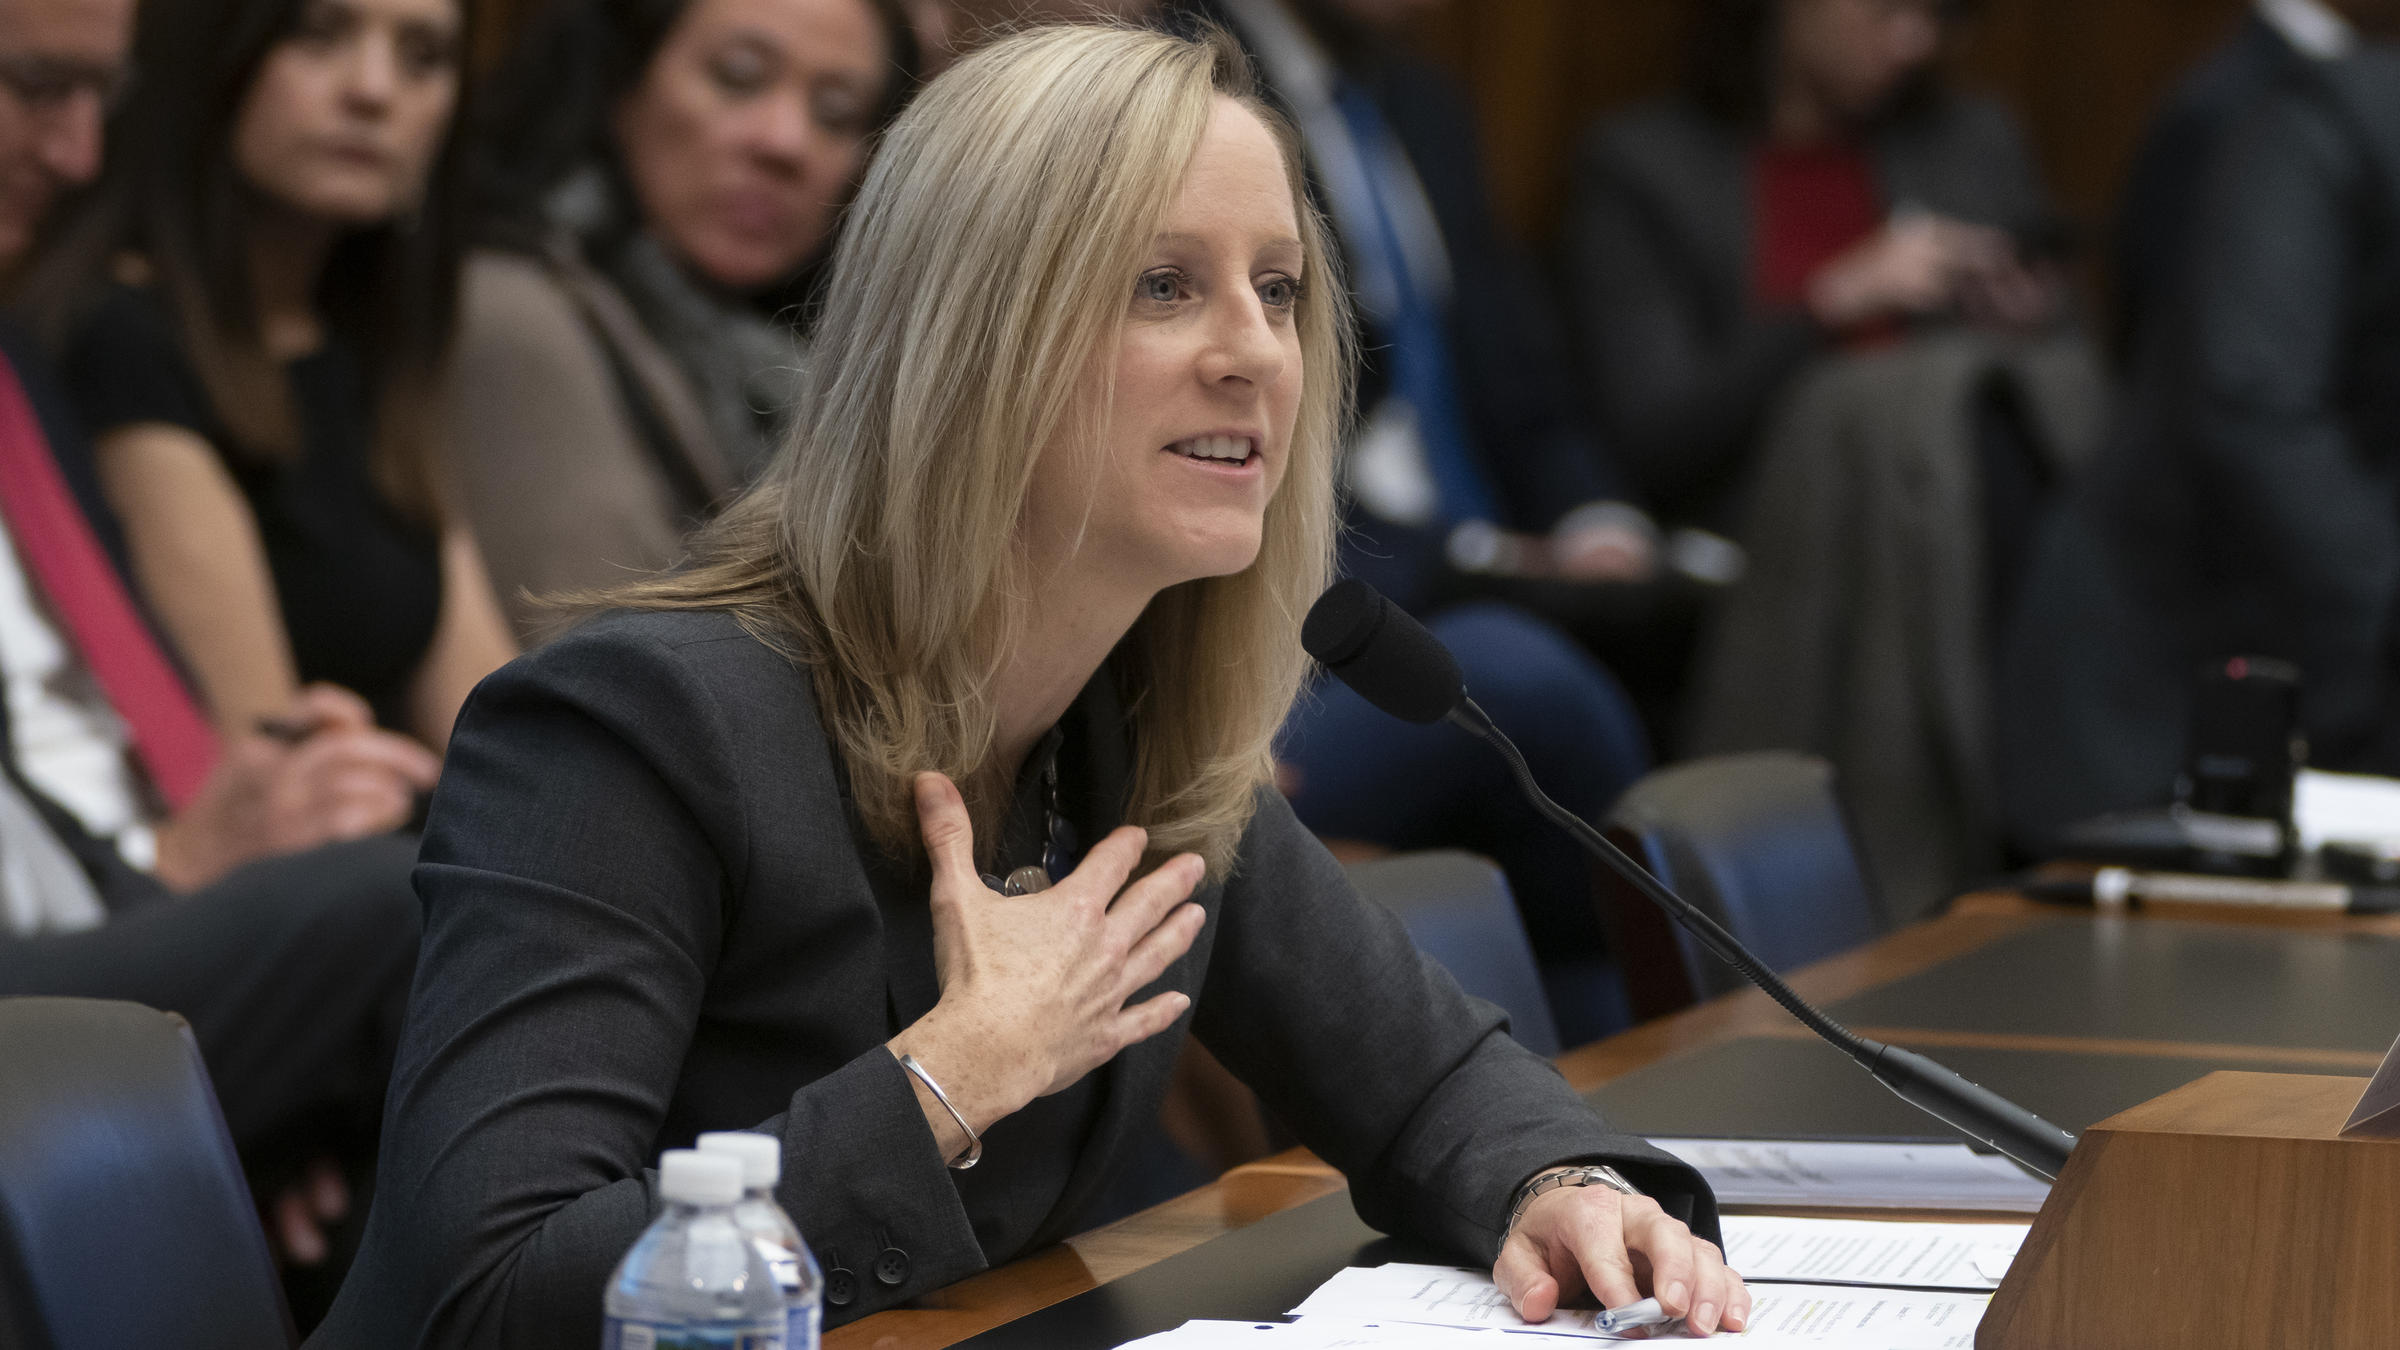 Senators Press CFPB To Dig Into Problems With Public Service Student Loan Program